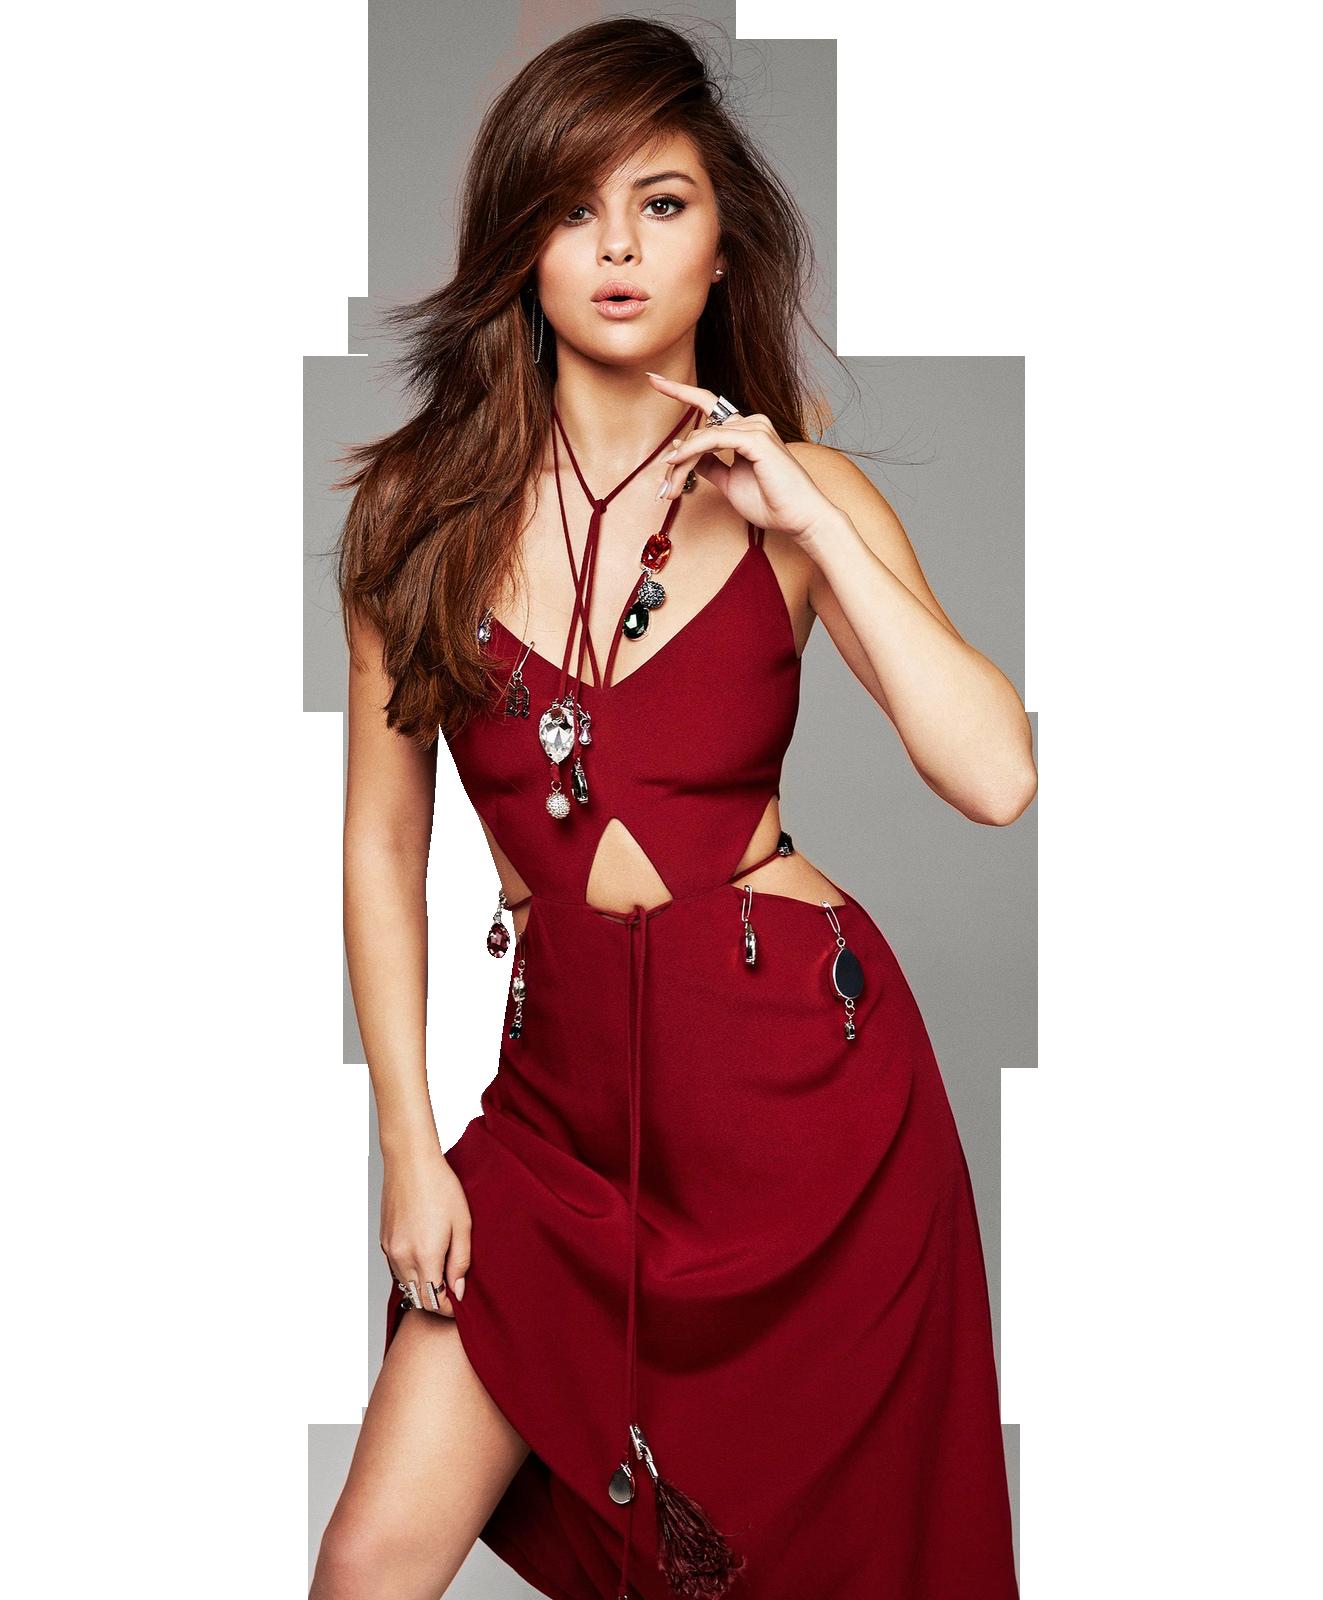 Selena Gomez Red Dress PNG Image